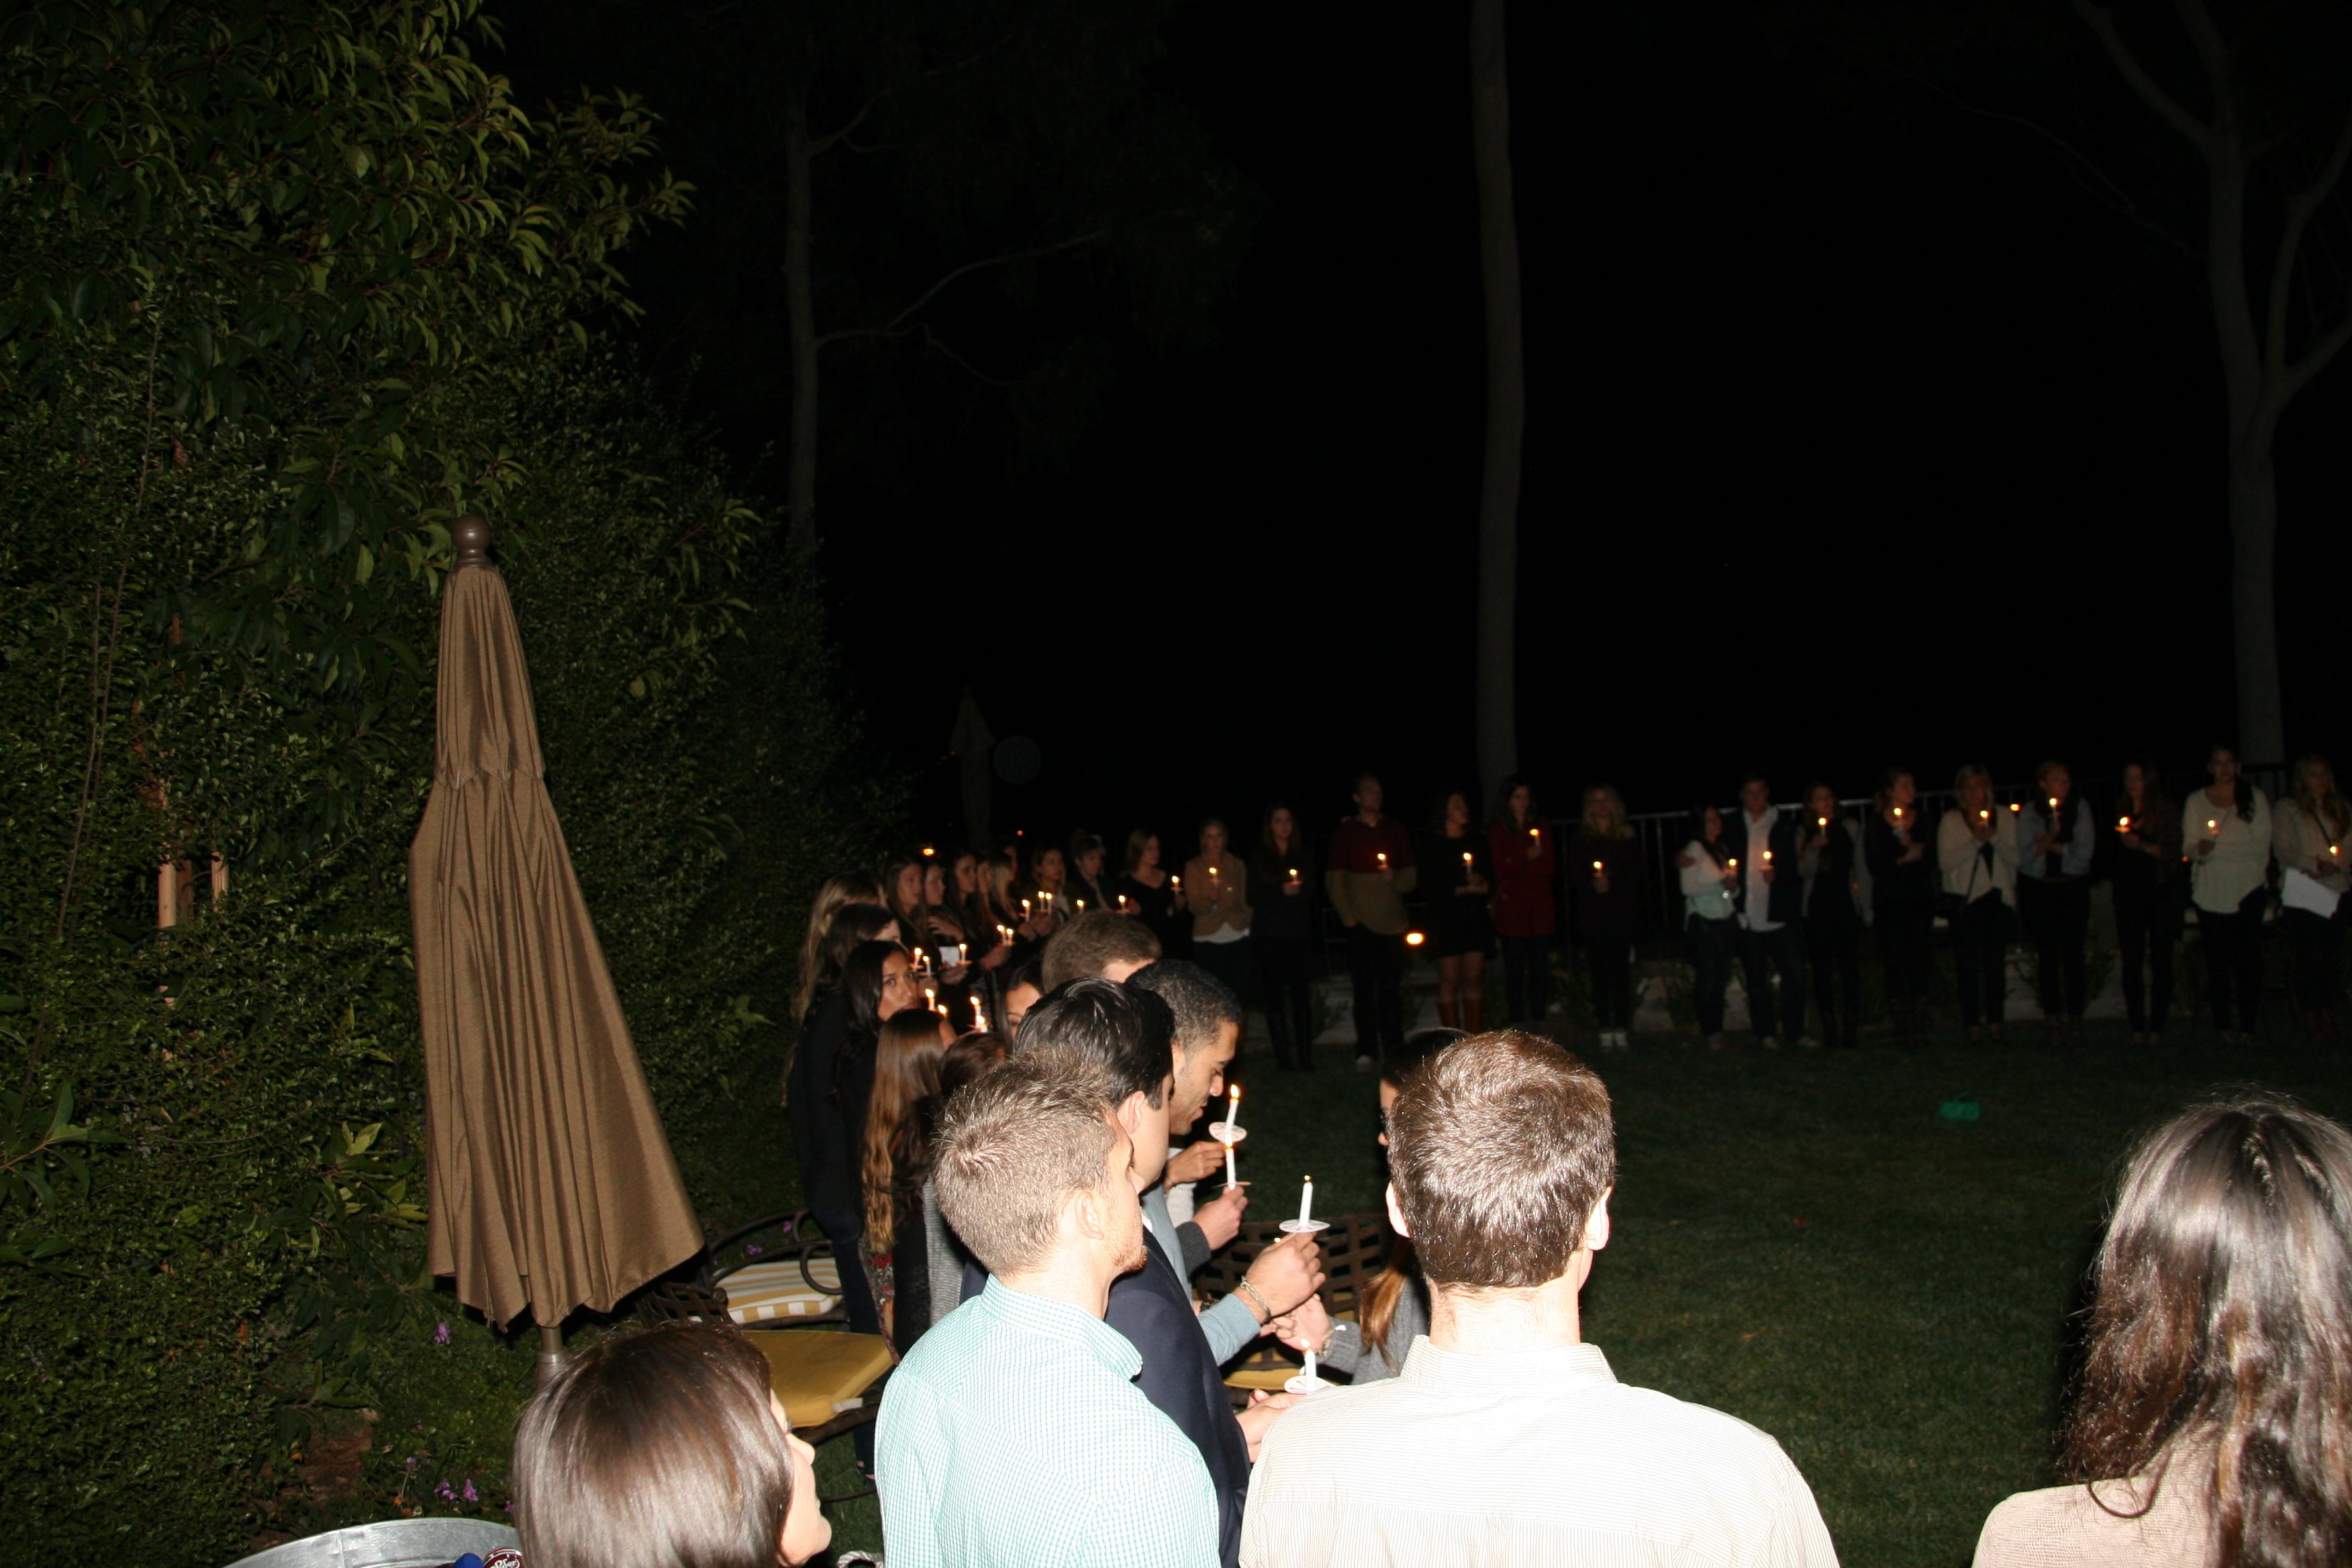 Matthew Nichols Memorial Vigil